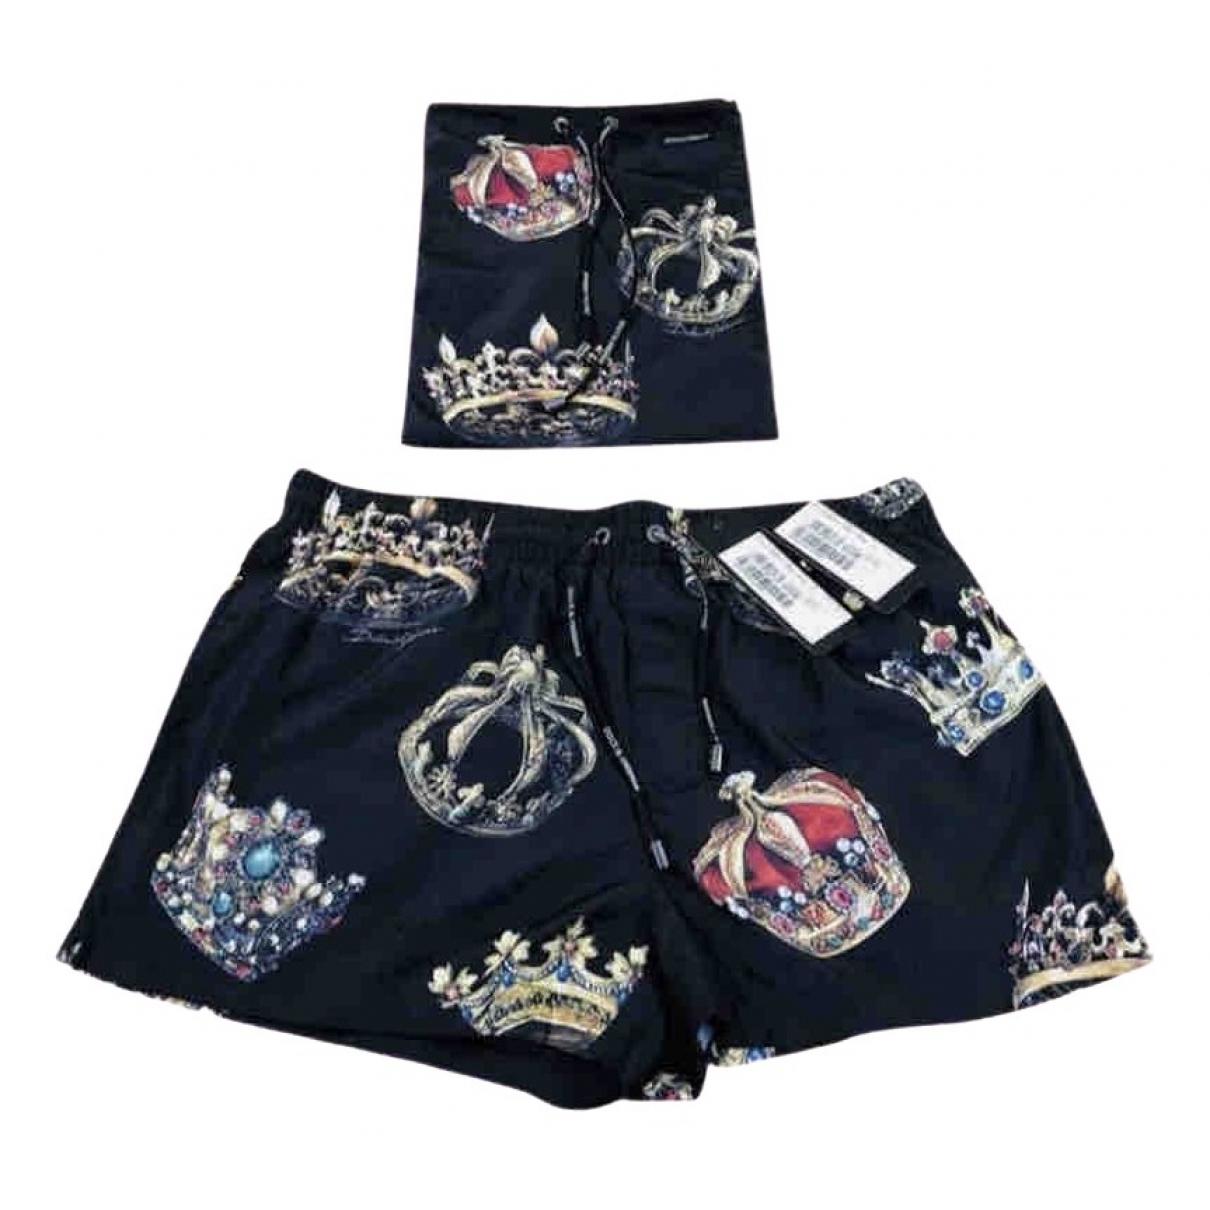 Dolce & Gabbana \N Badeanzug in  Schwarz Polyester